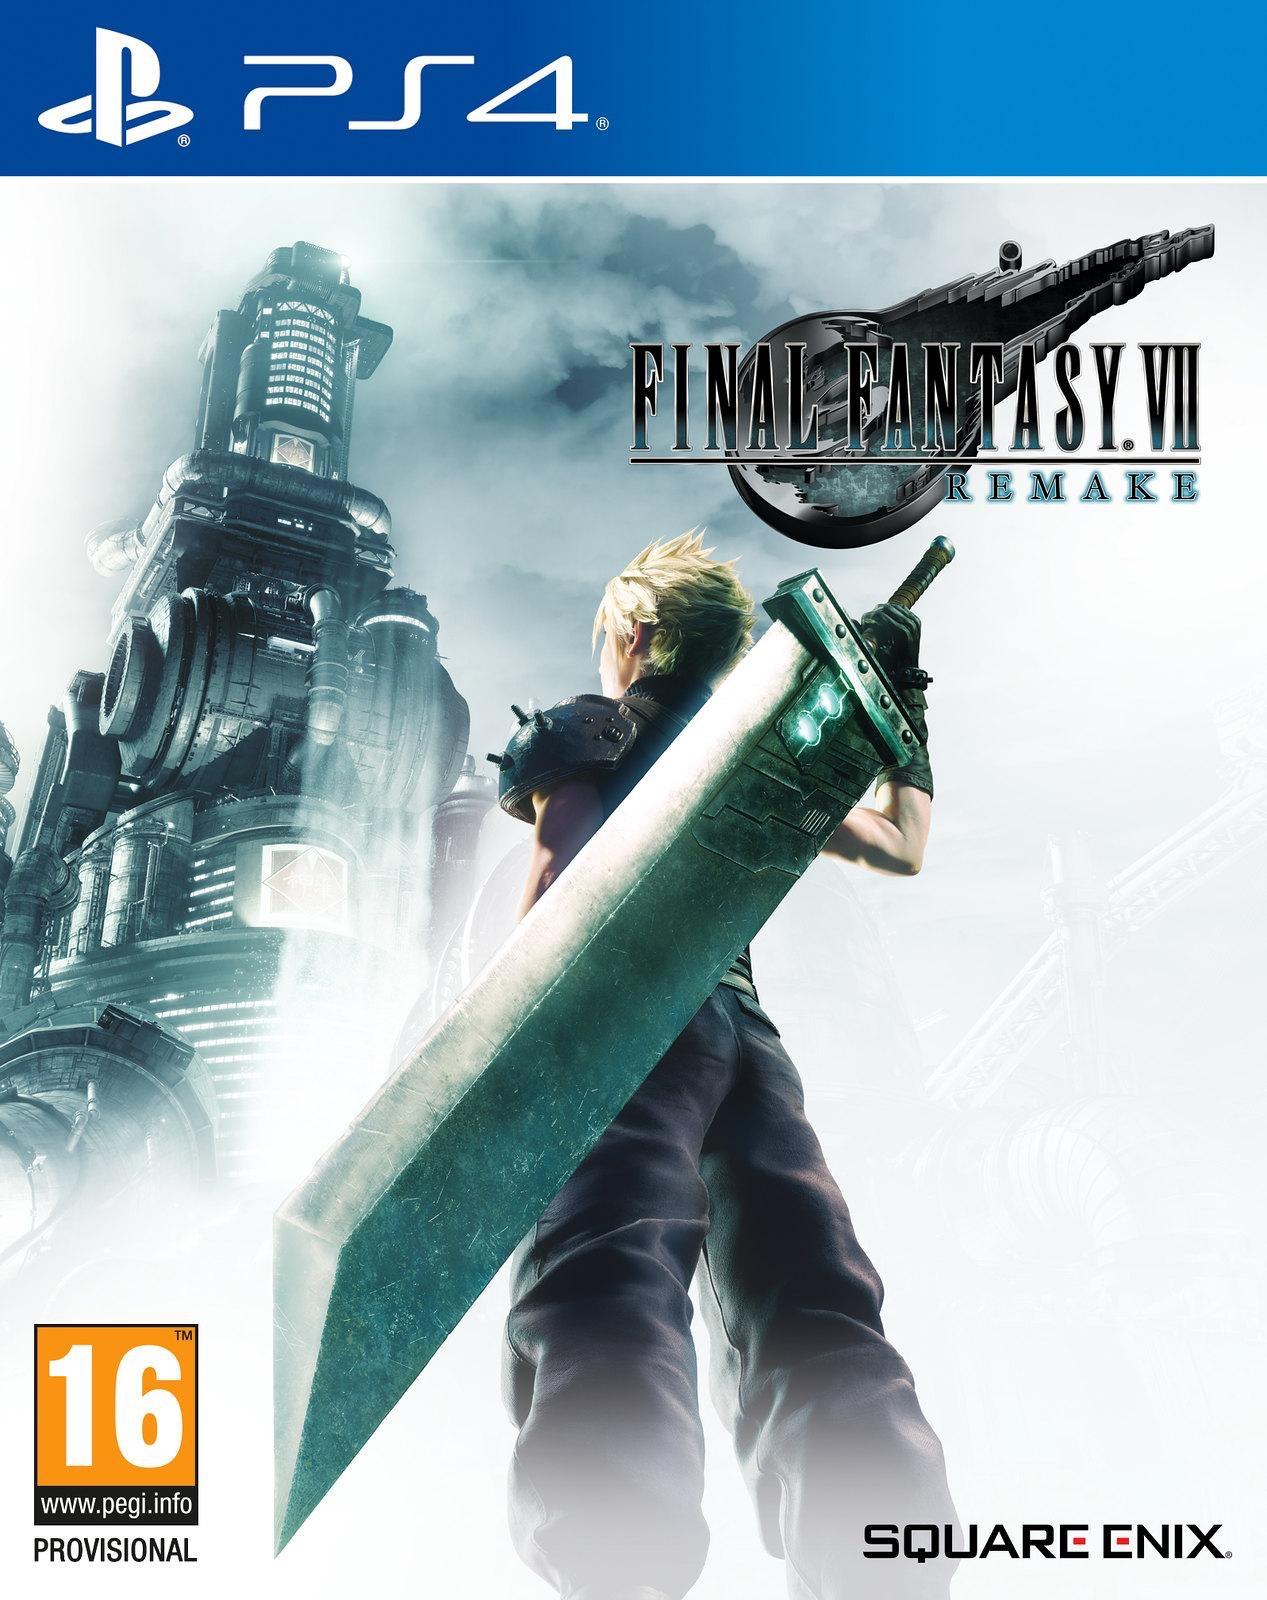 Final Fantasy VII Remake - Square Enix